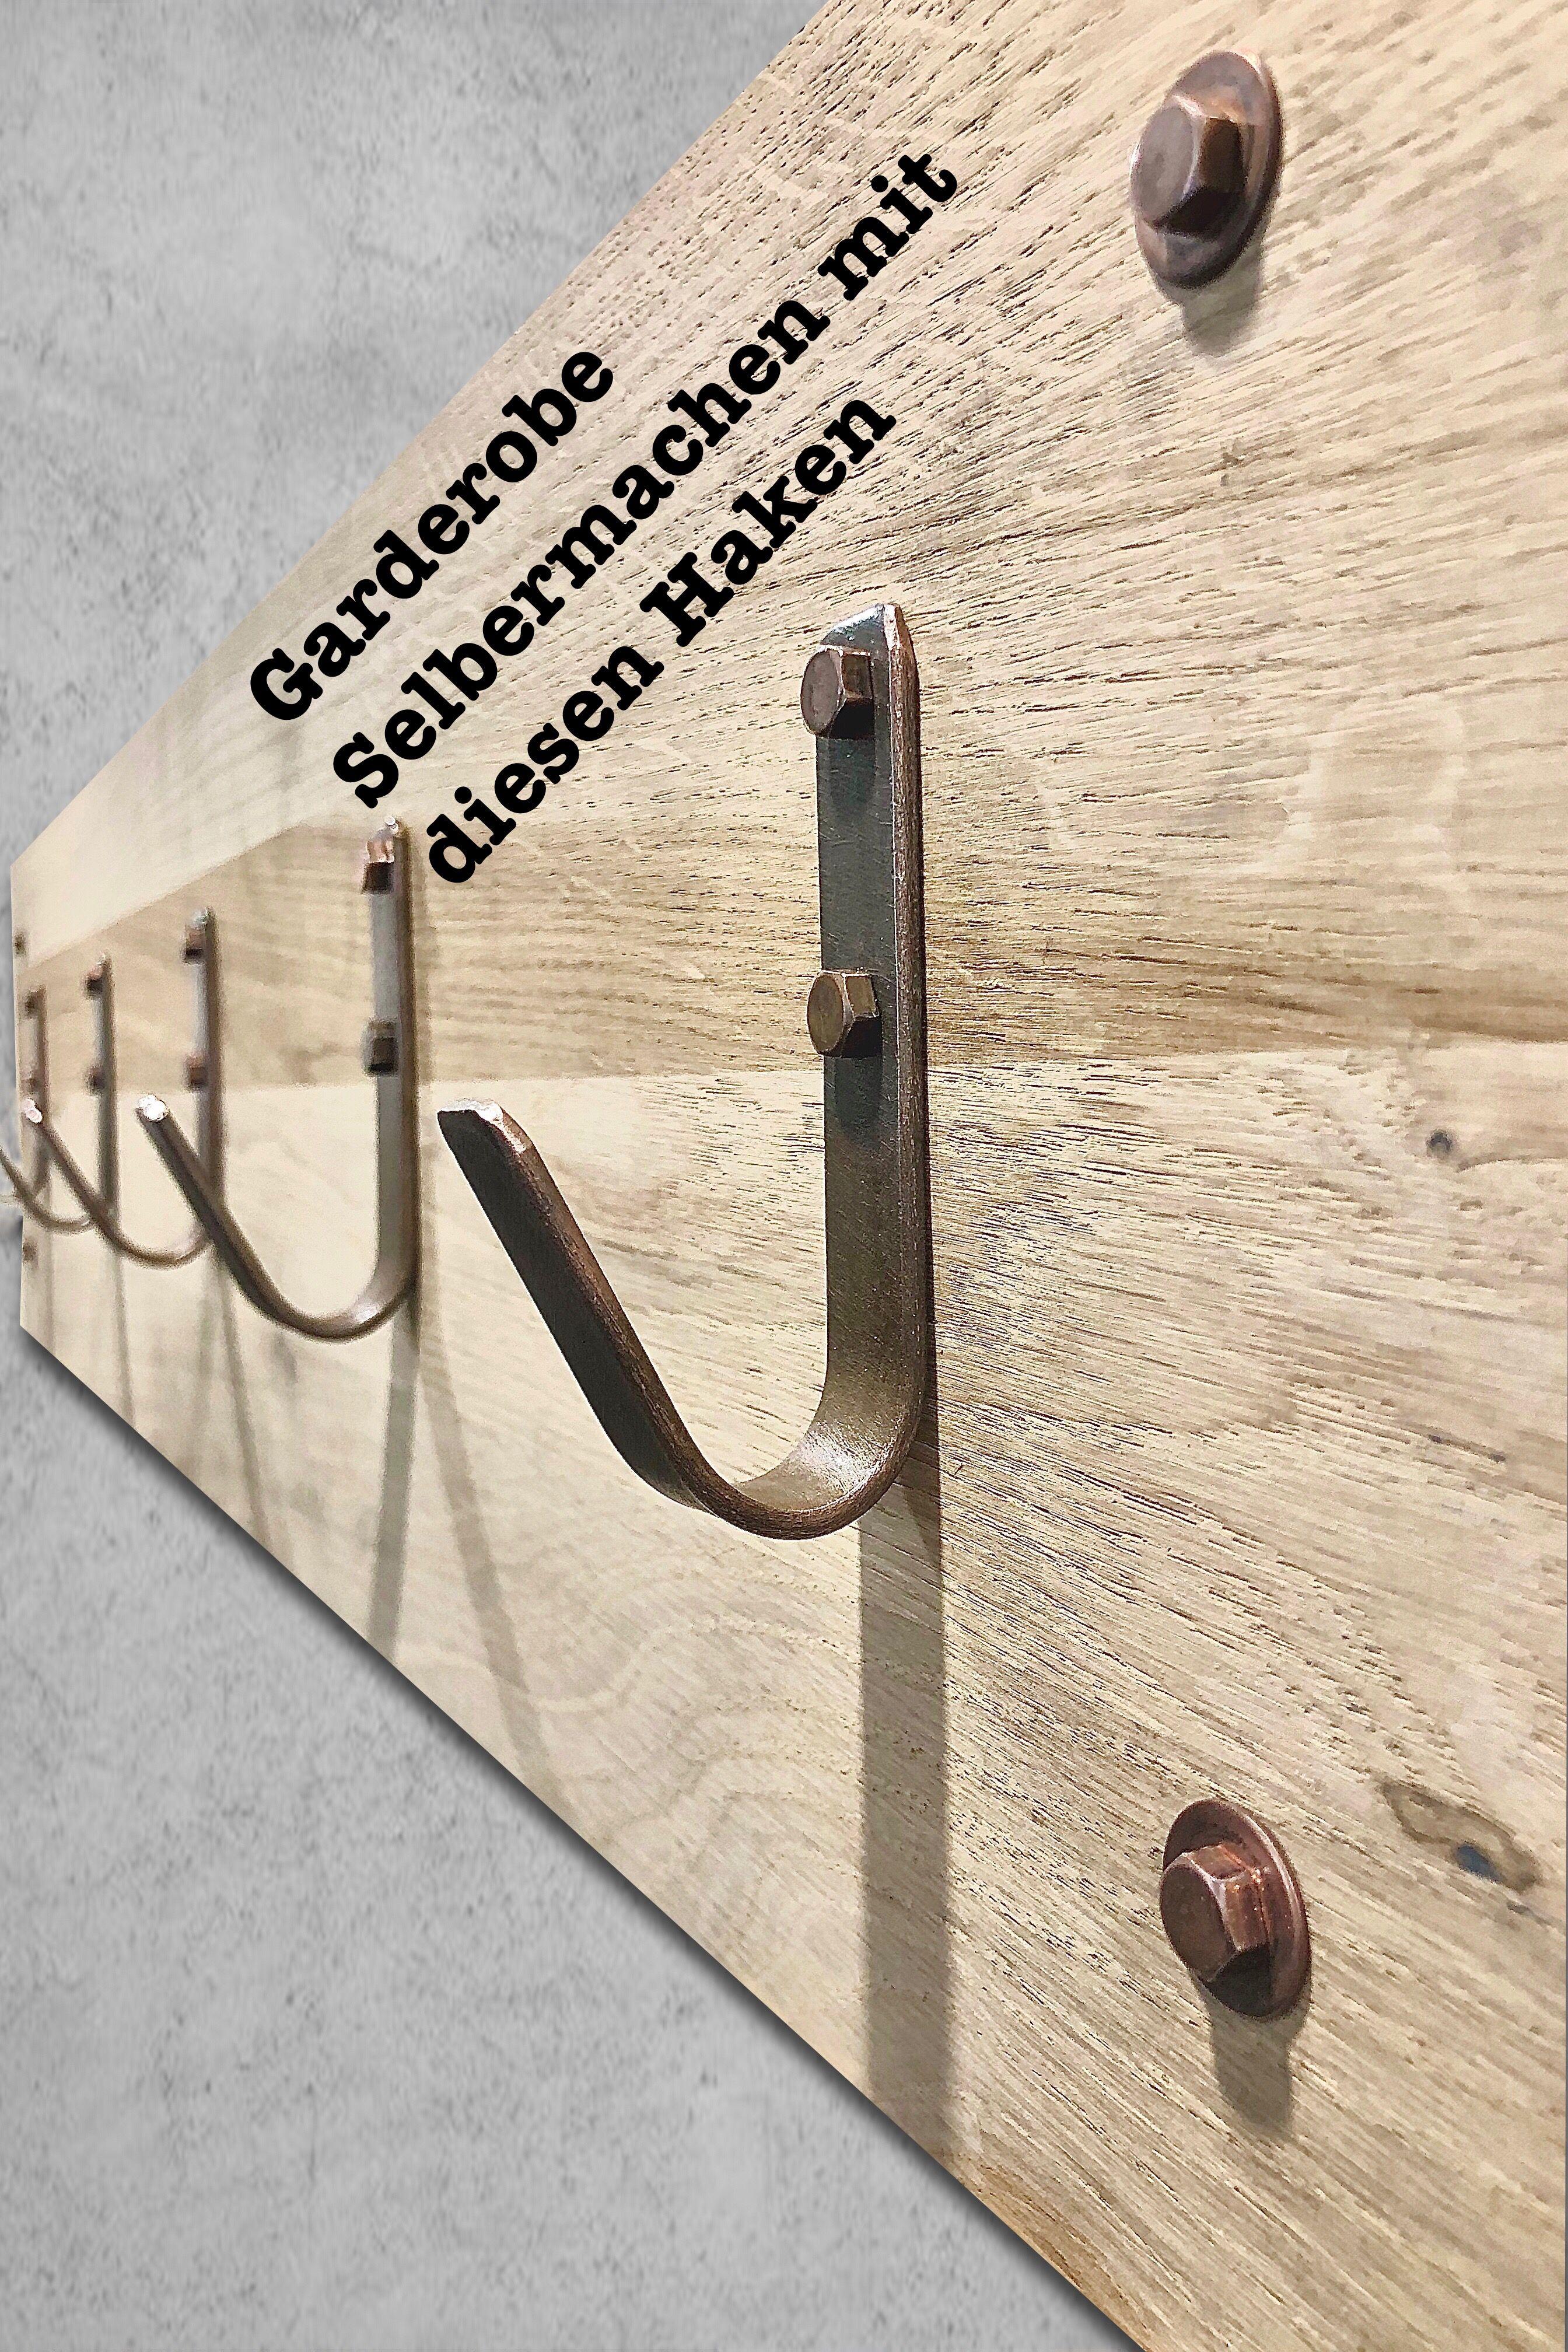 Hook Holder For Wardrobe Bedroom Bathroom Workshop Garage Garden Utensils Tools Vintage Industrial Antique Rustic Diy Self In 2020 Rustic Diy Garage Workshop Vintage Industrial Design